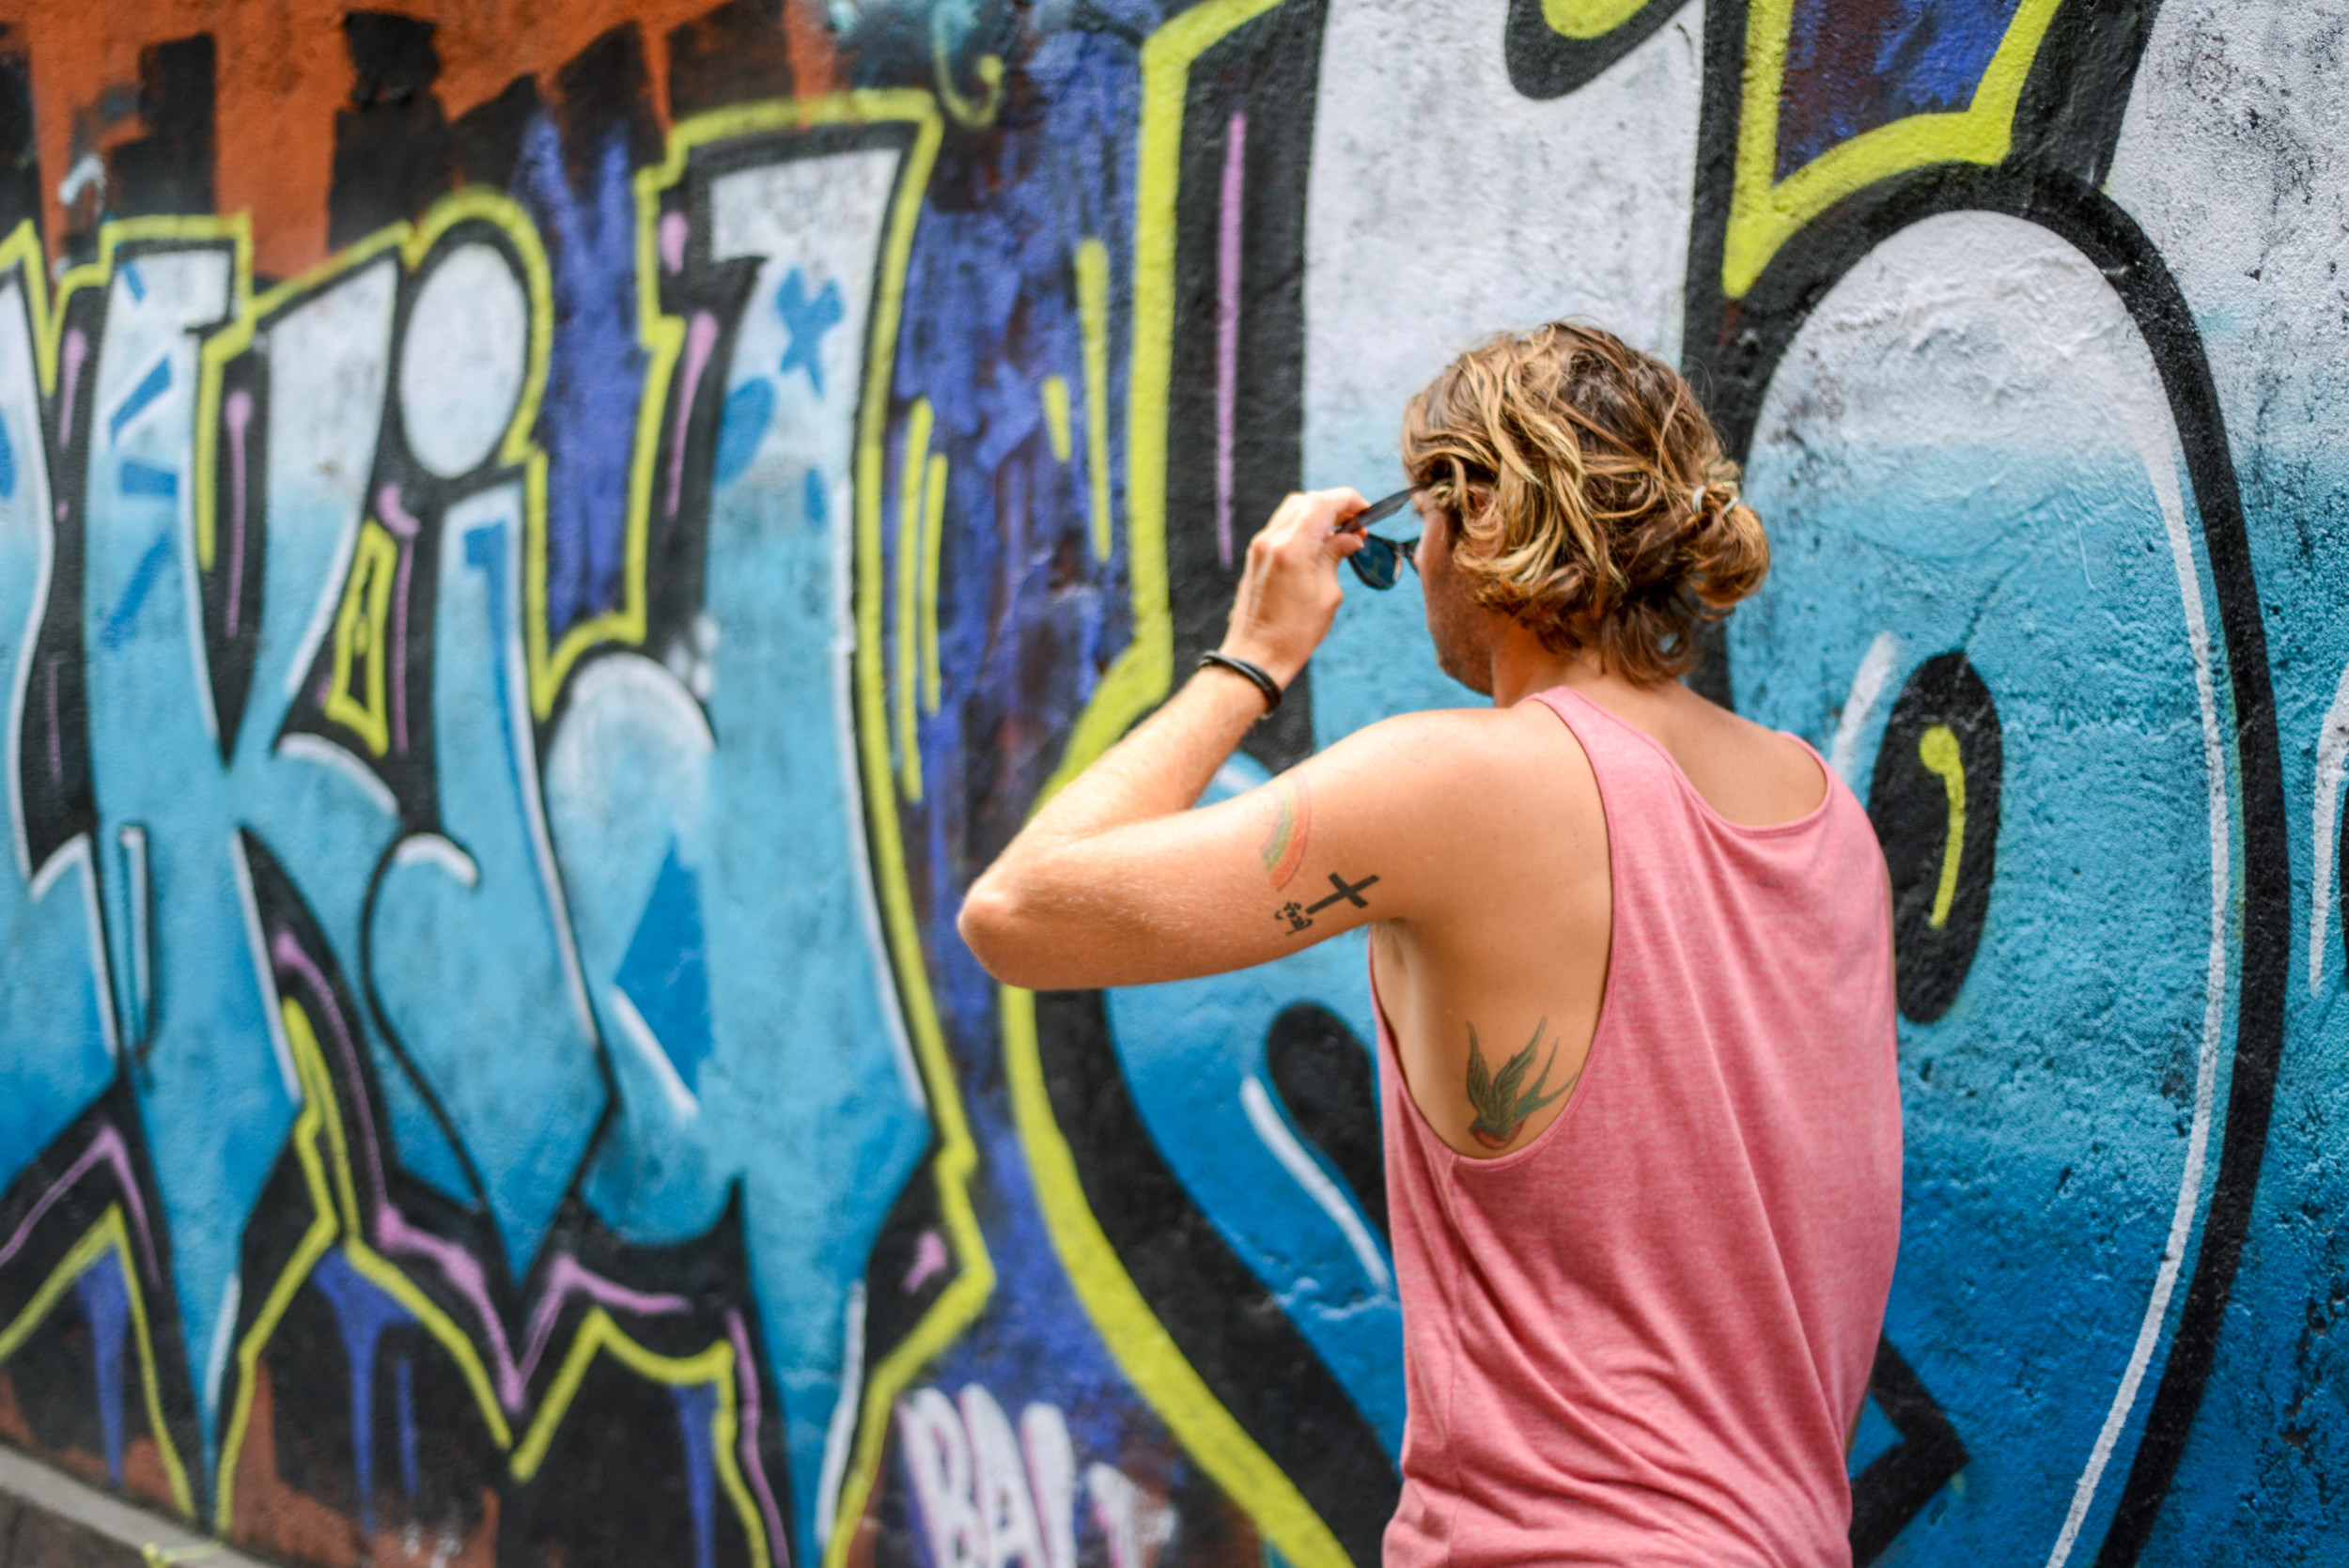 Colourful graffiti on the streets of Kuta.